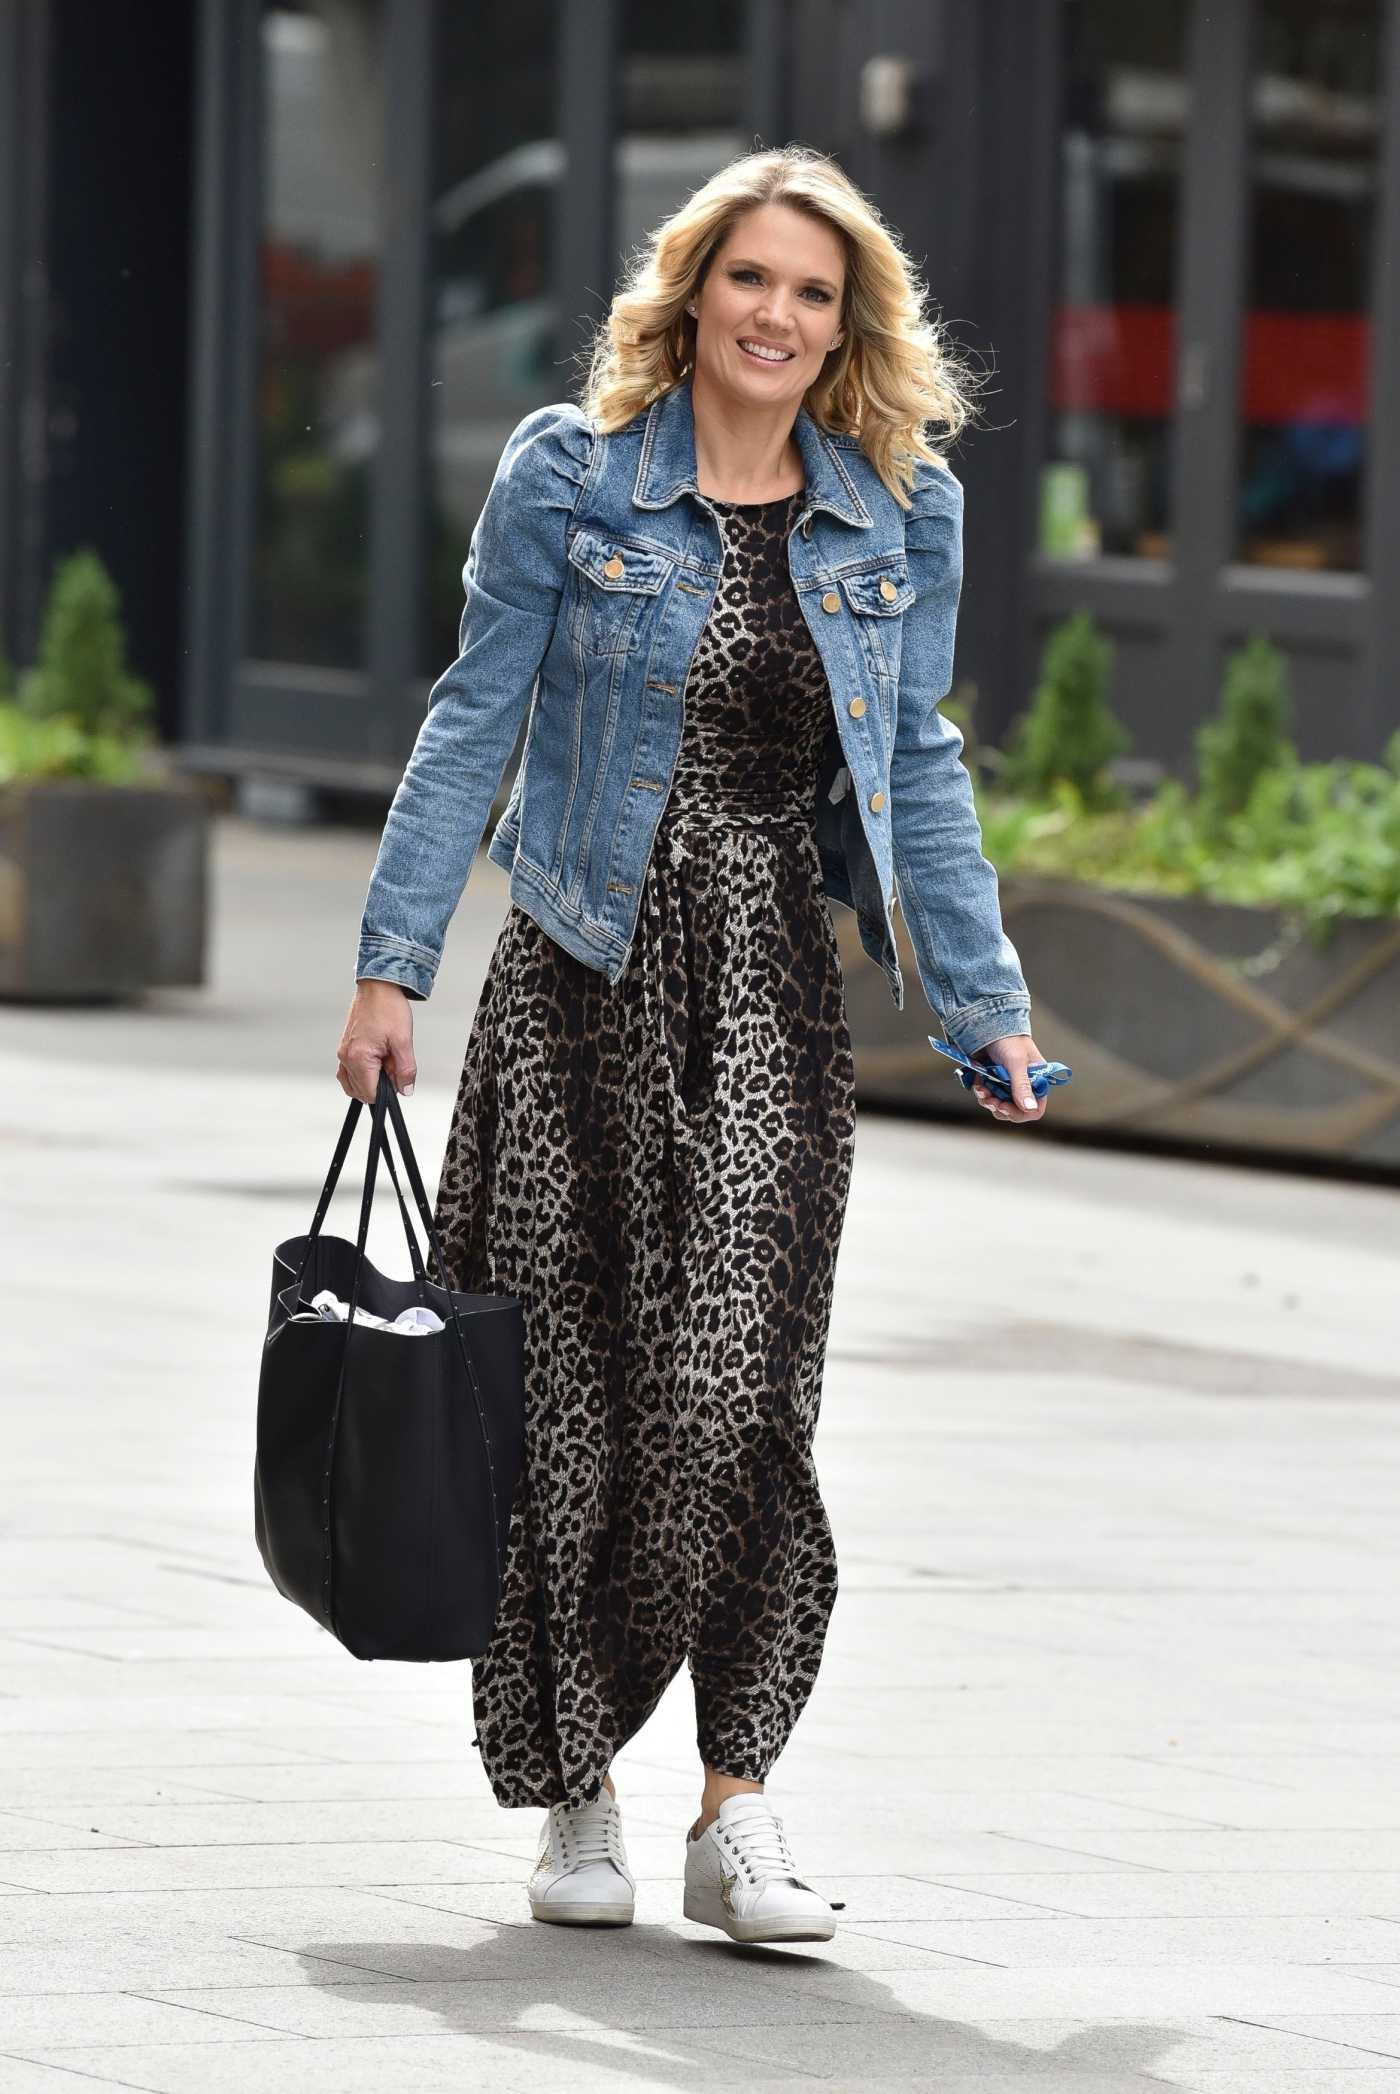 Charlotte Hawkins in a Leopard Print Dress Arrives at the Global Radio Studios in London 05/22/2020